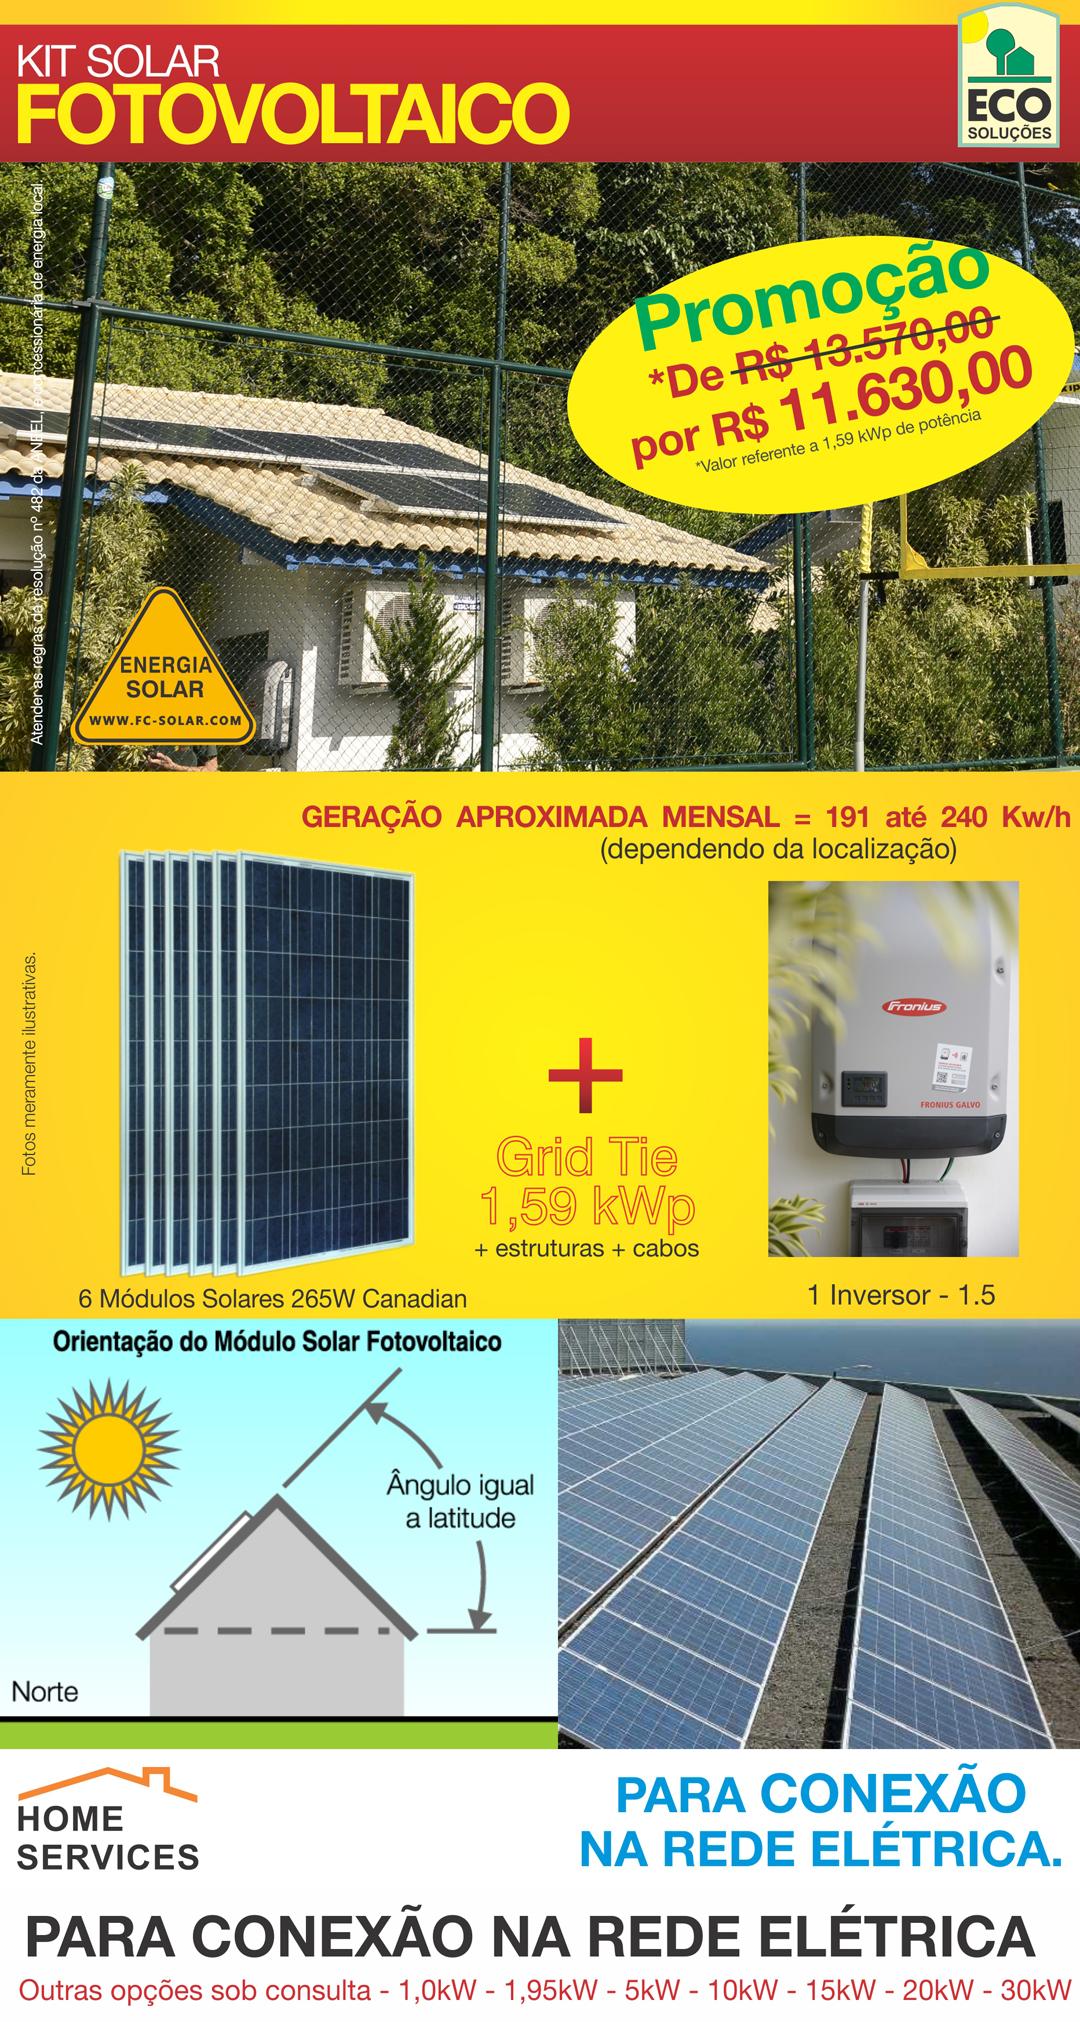 kit-solar-banner-promocao-159-012017